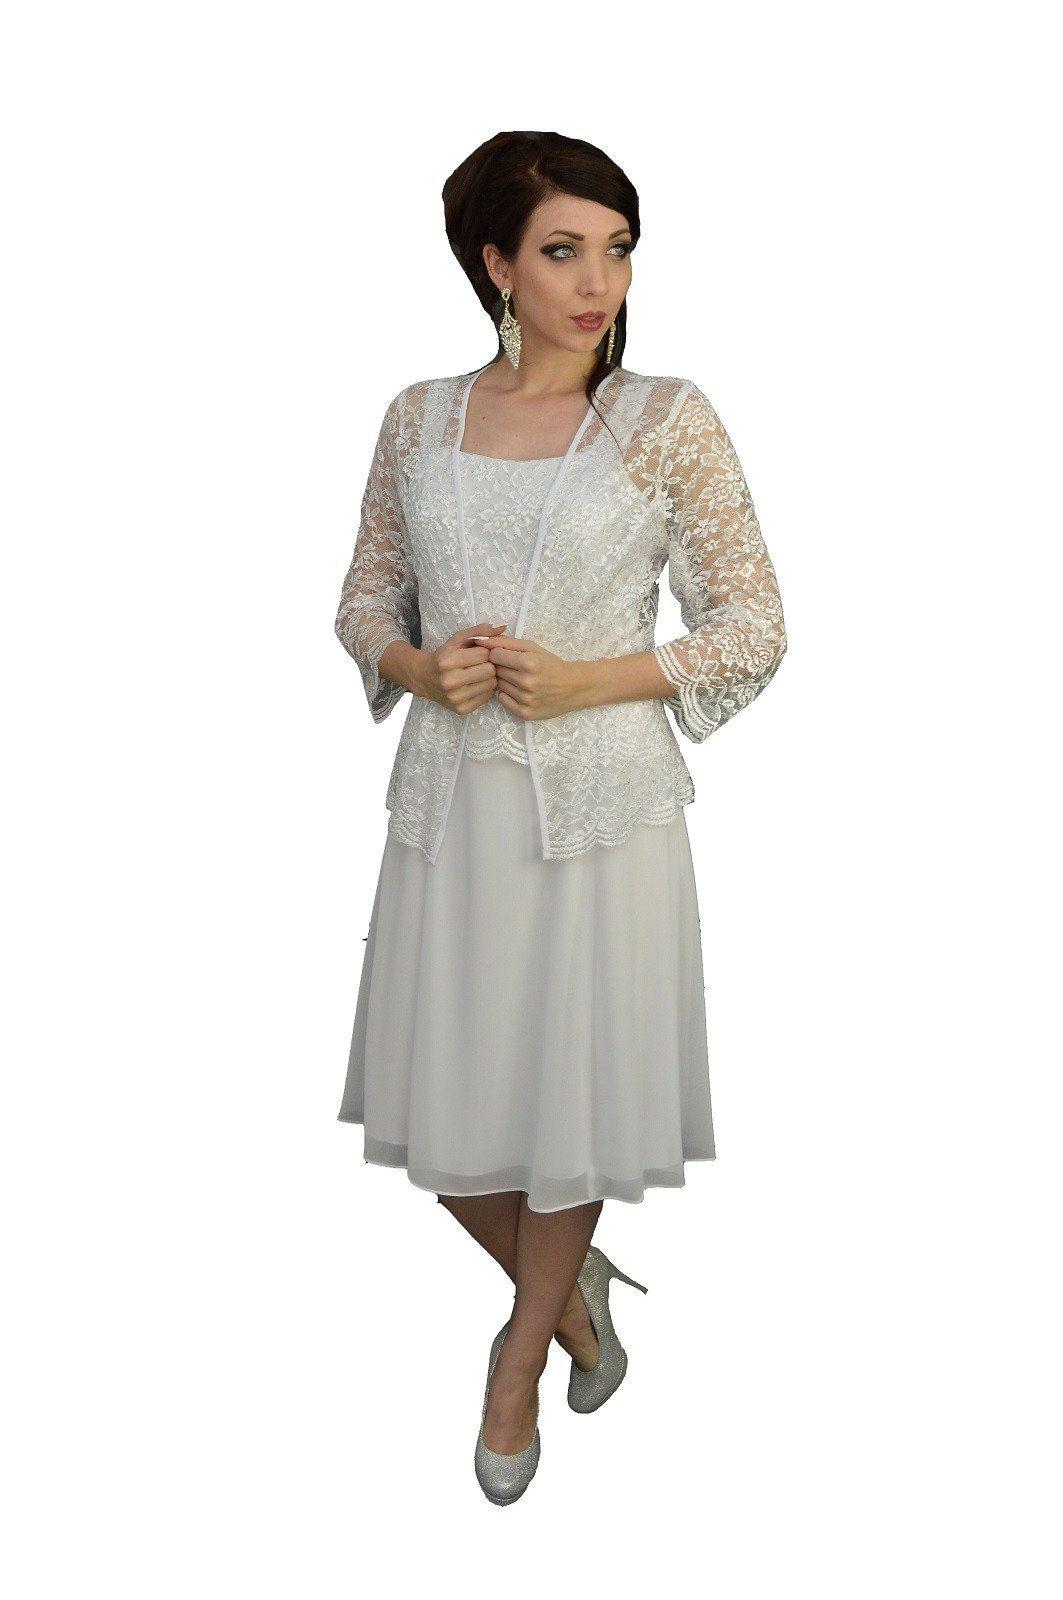 Plus size jacket dress for wedding  Short Mother of the Bride Dress with Jacket   Bride dresses